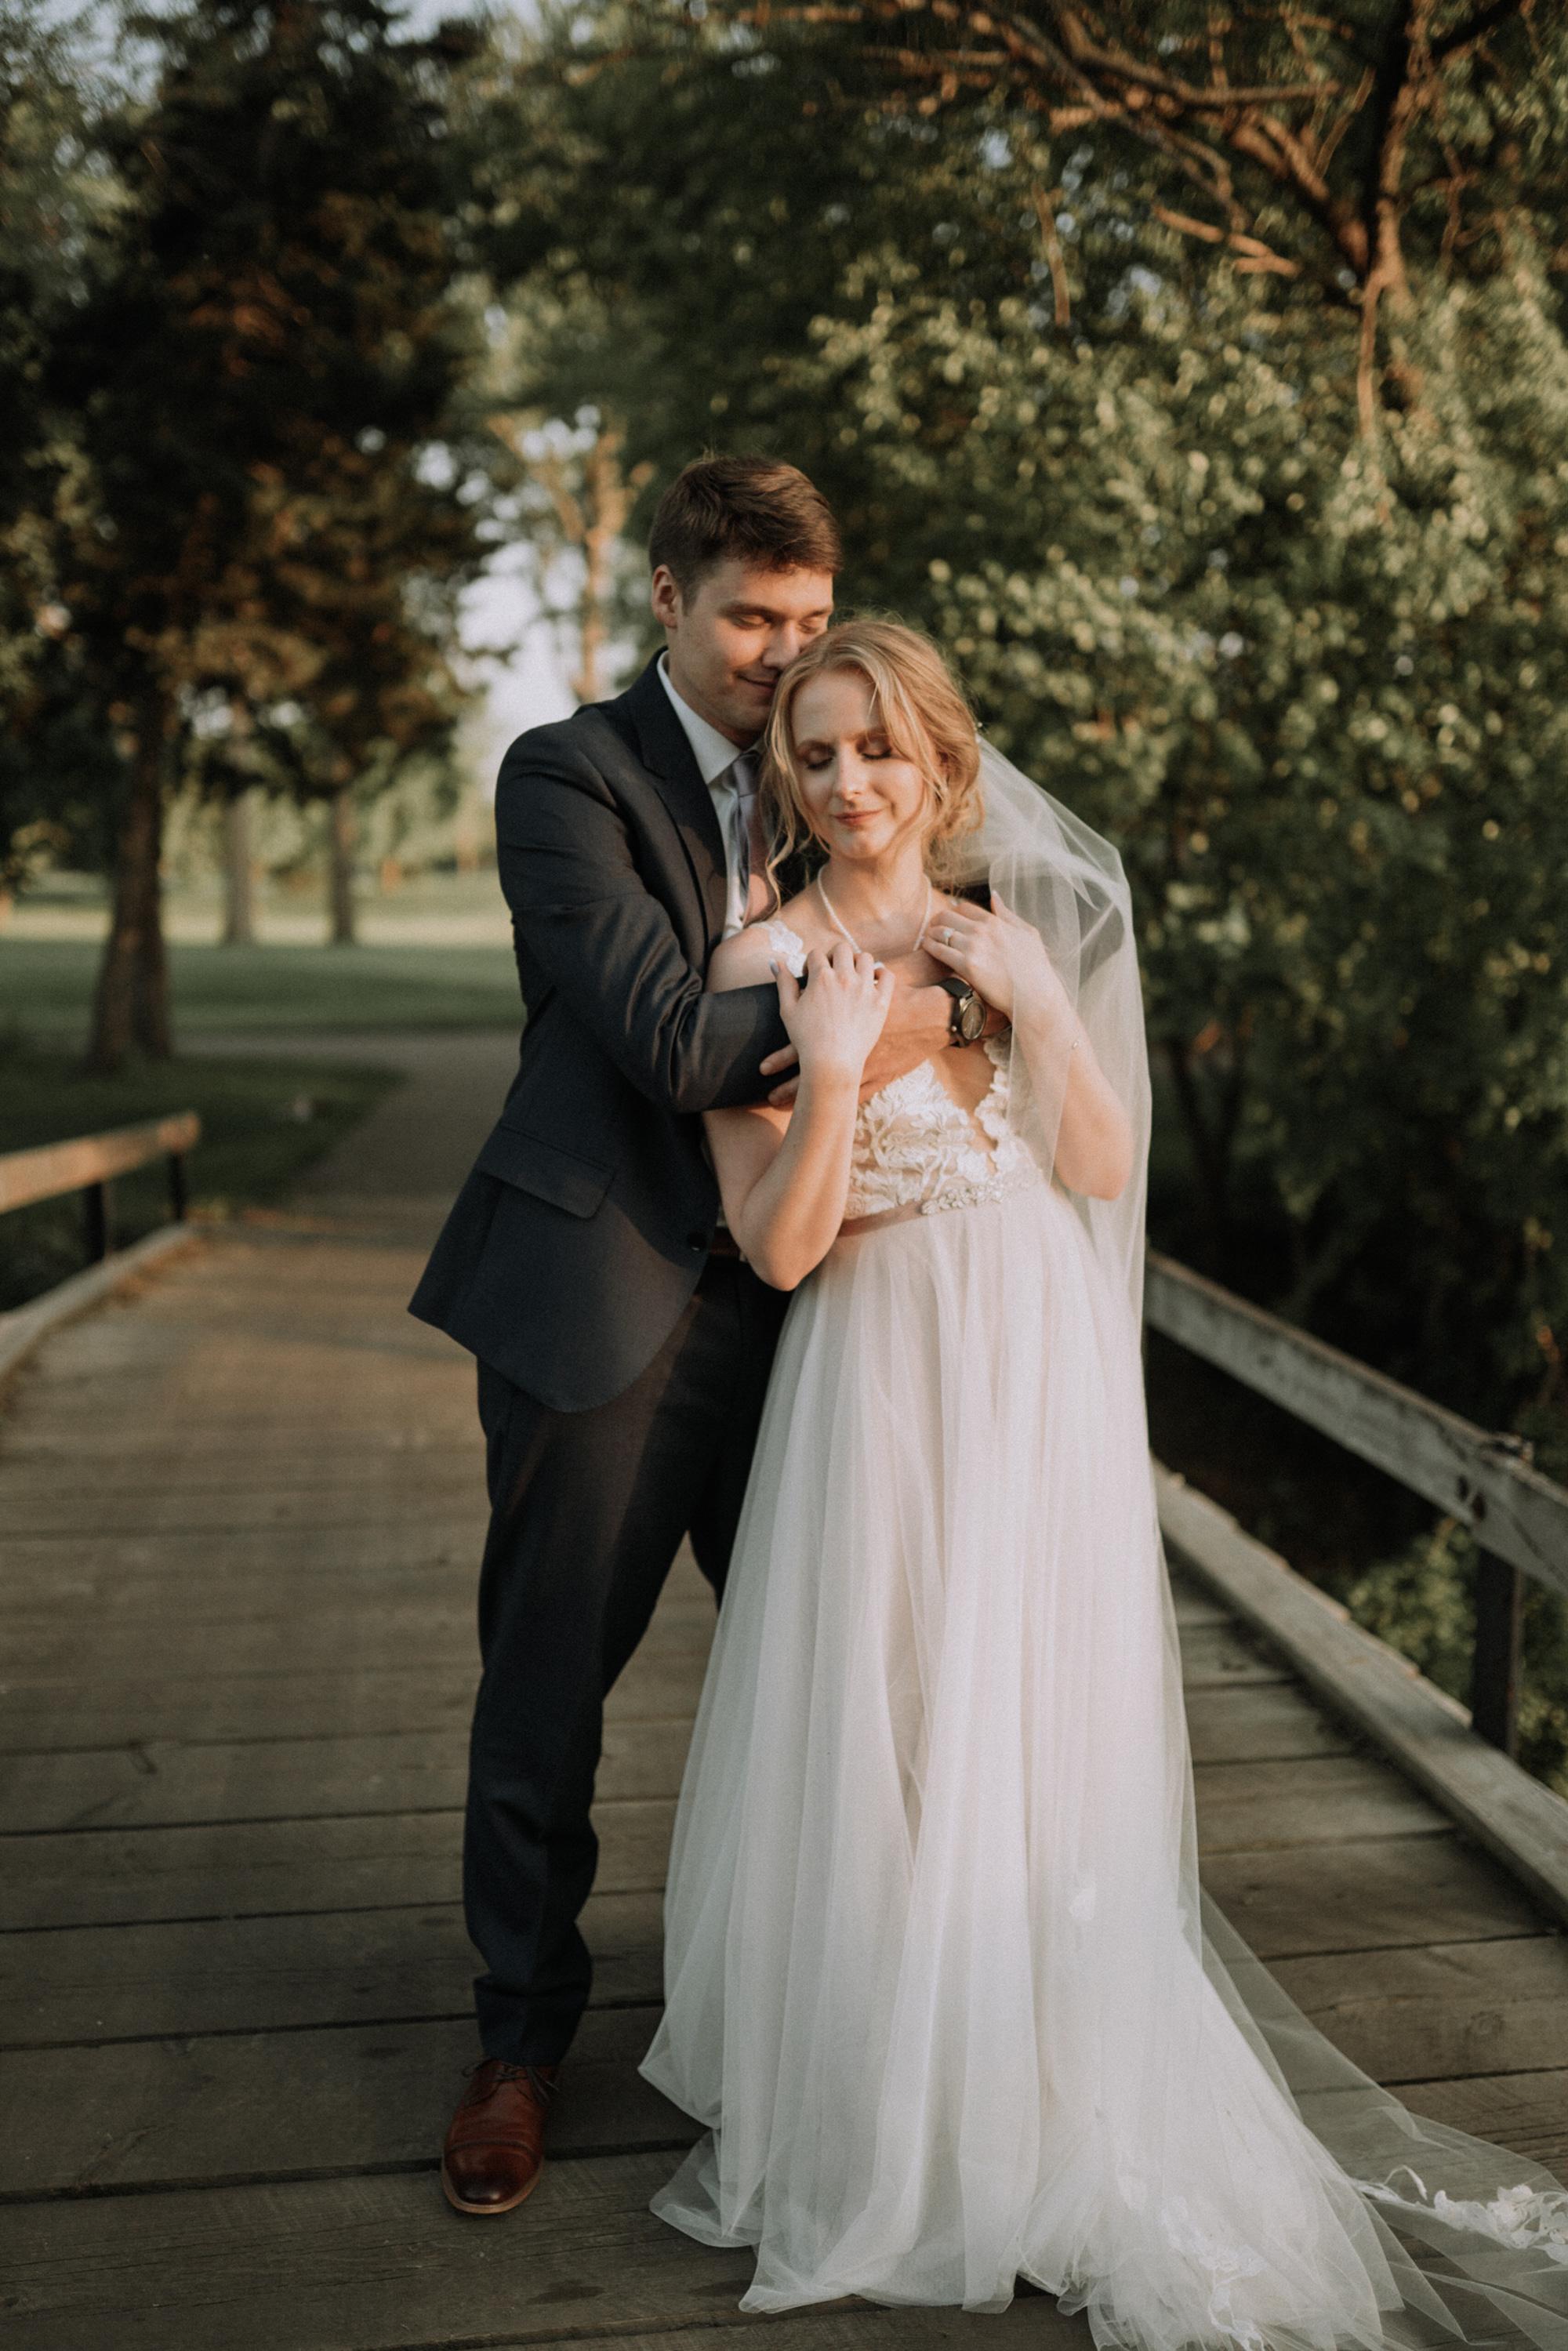 Wedding_(6_of_10).jpg